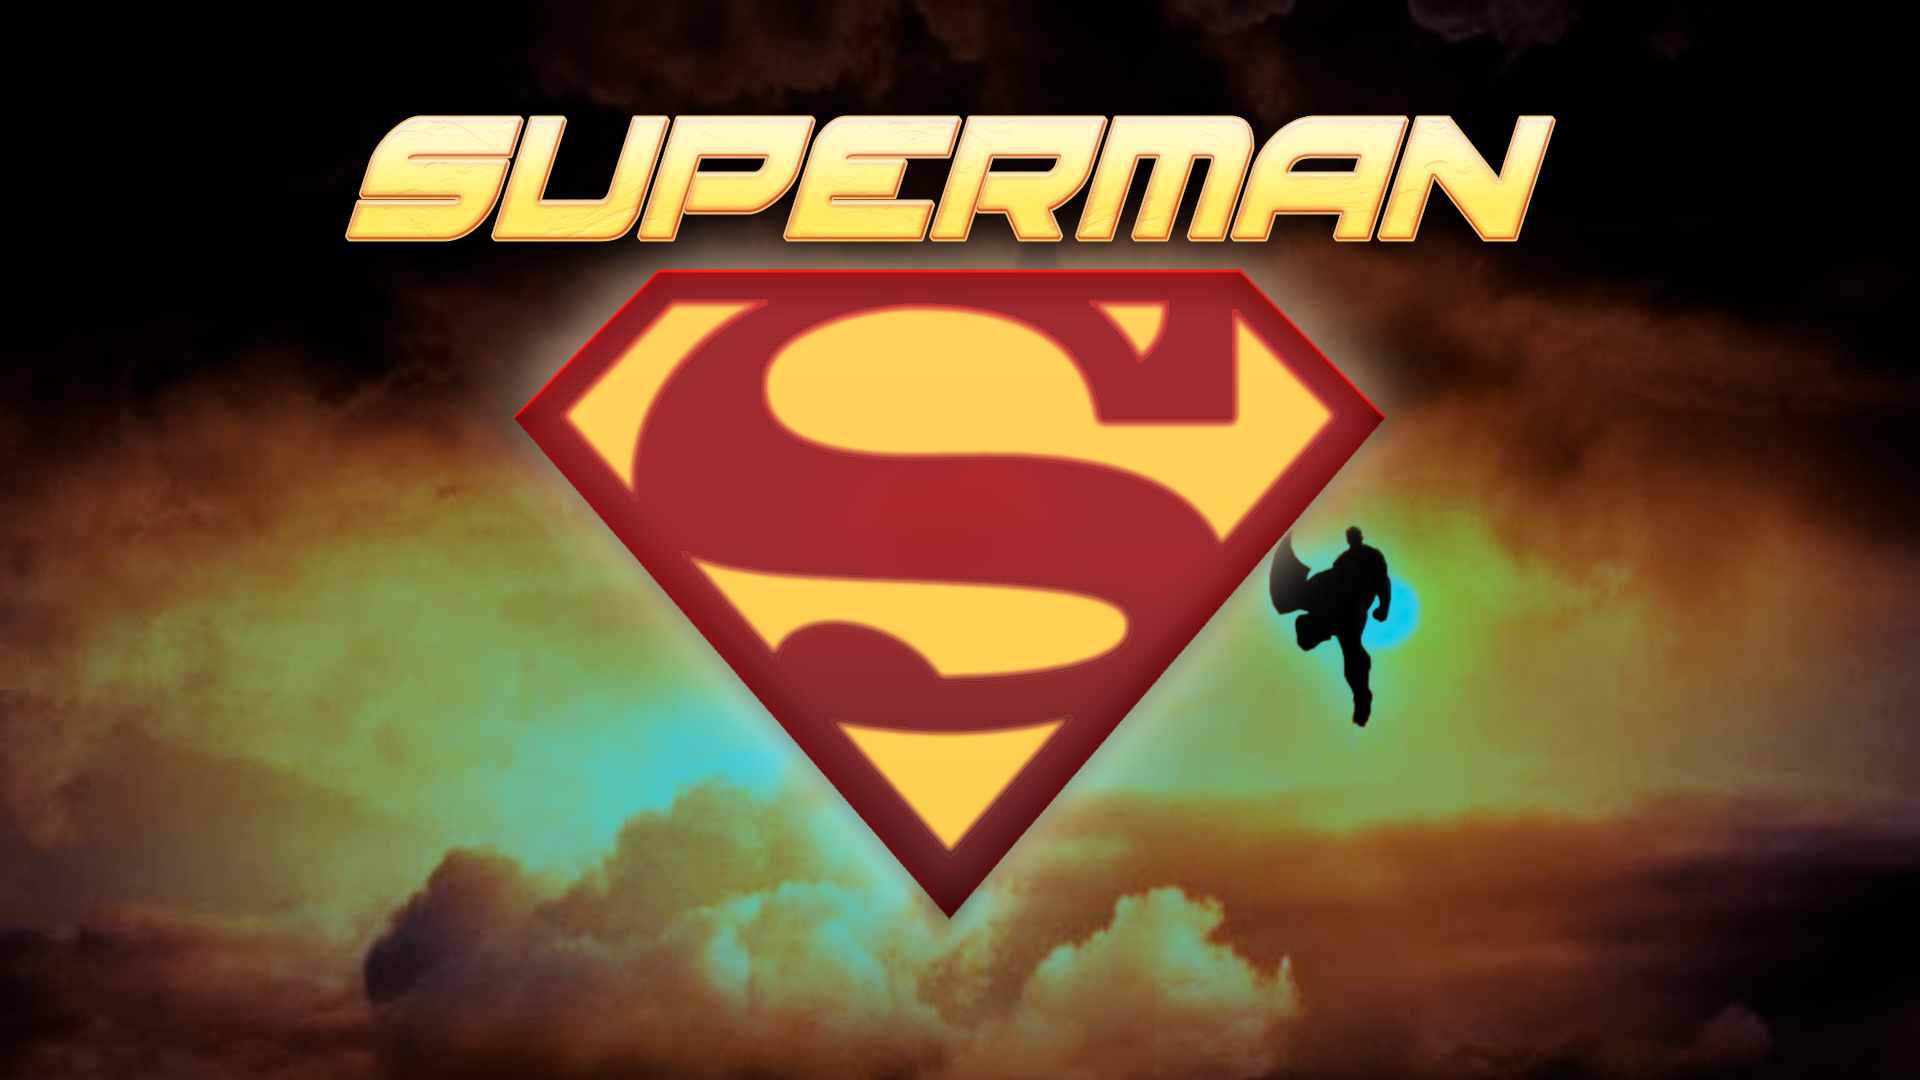 Superman man of steel logo wallpaper 1920x1080 by revafallarts on deviantart - Wallpaper superman man of steel ...